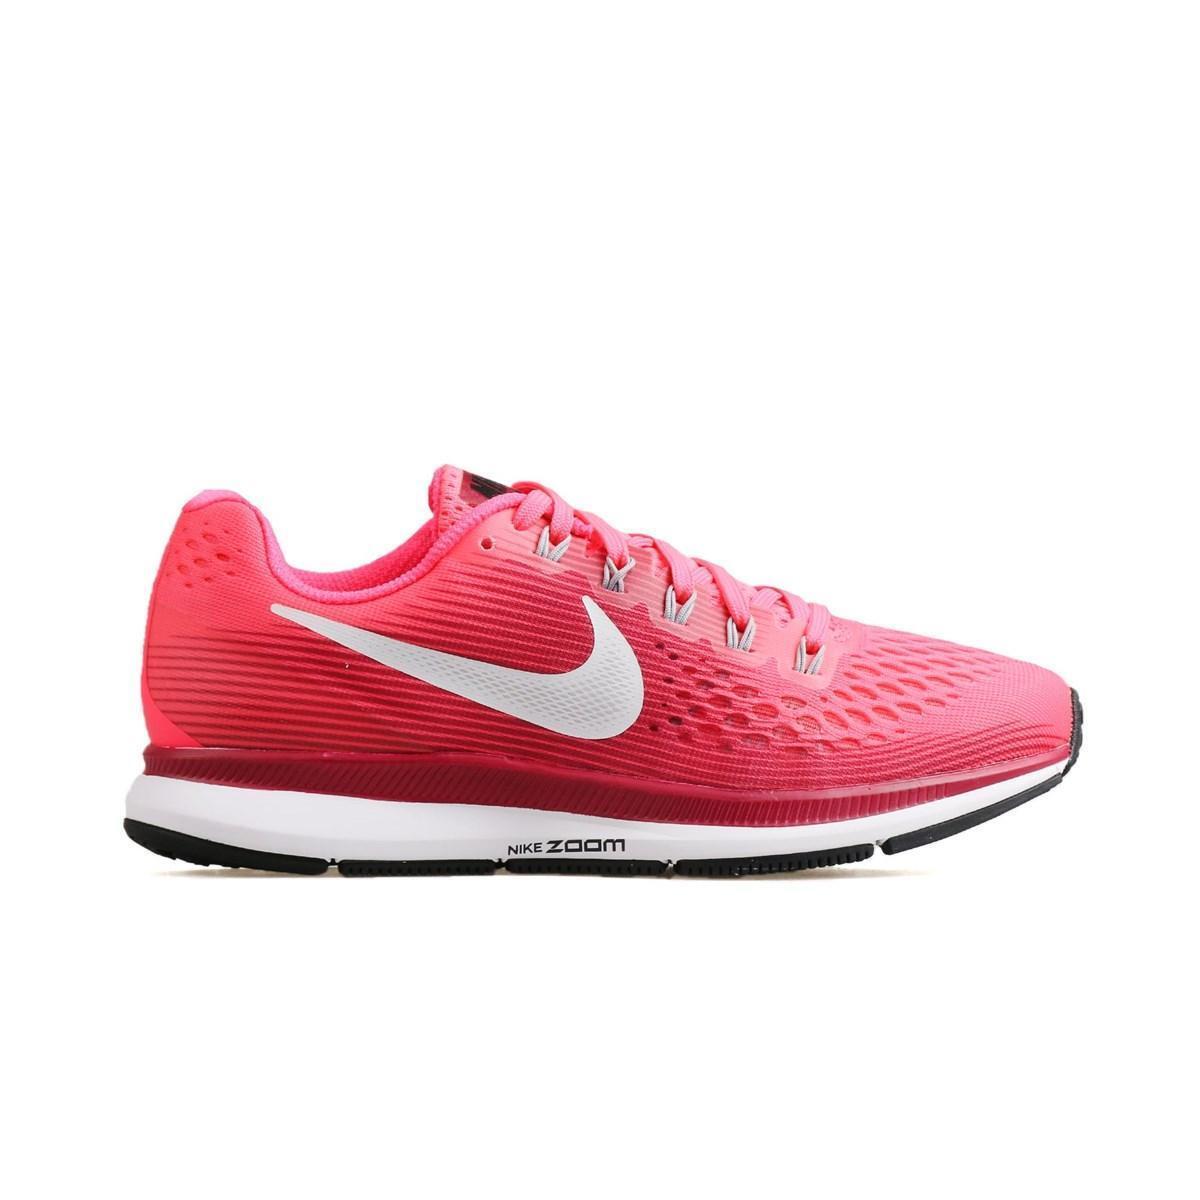 Womens NIKE AIR ZOOM PEGASUS 34 Pink Running Trainers 880560 605